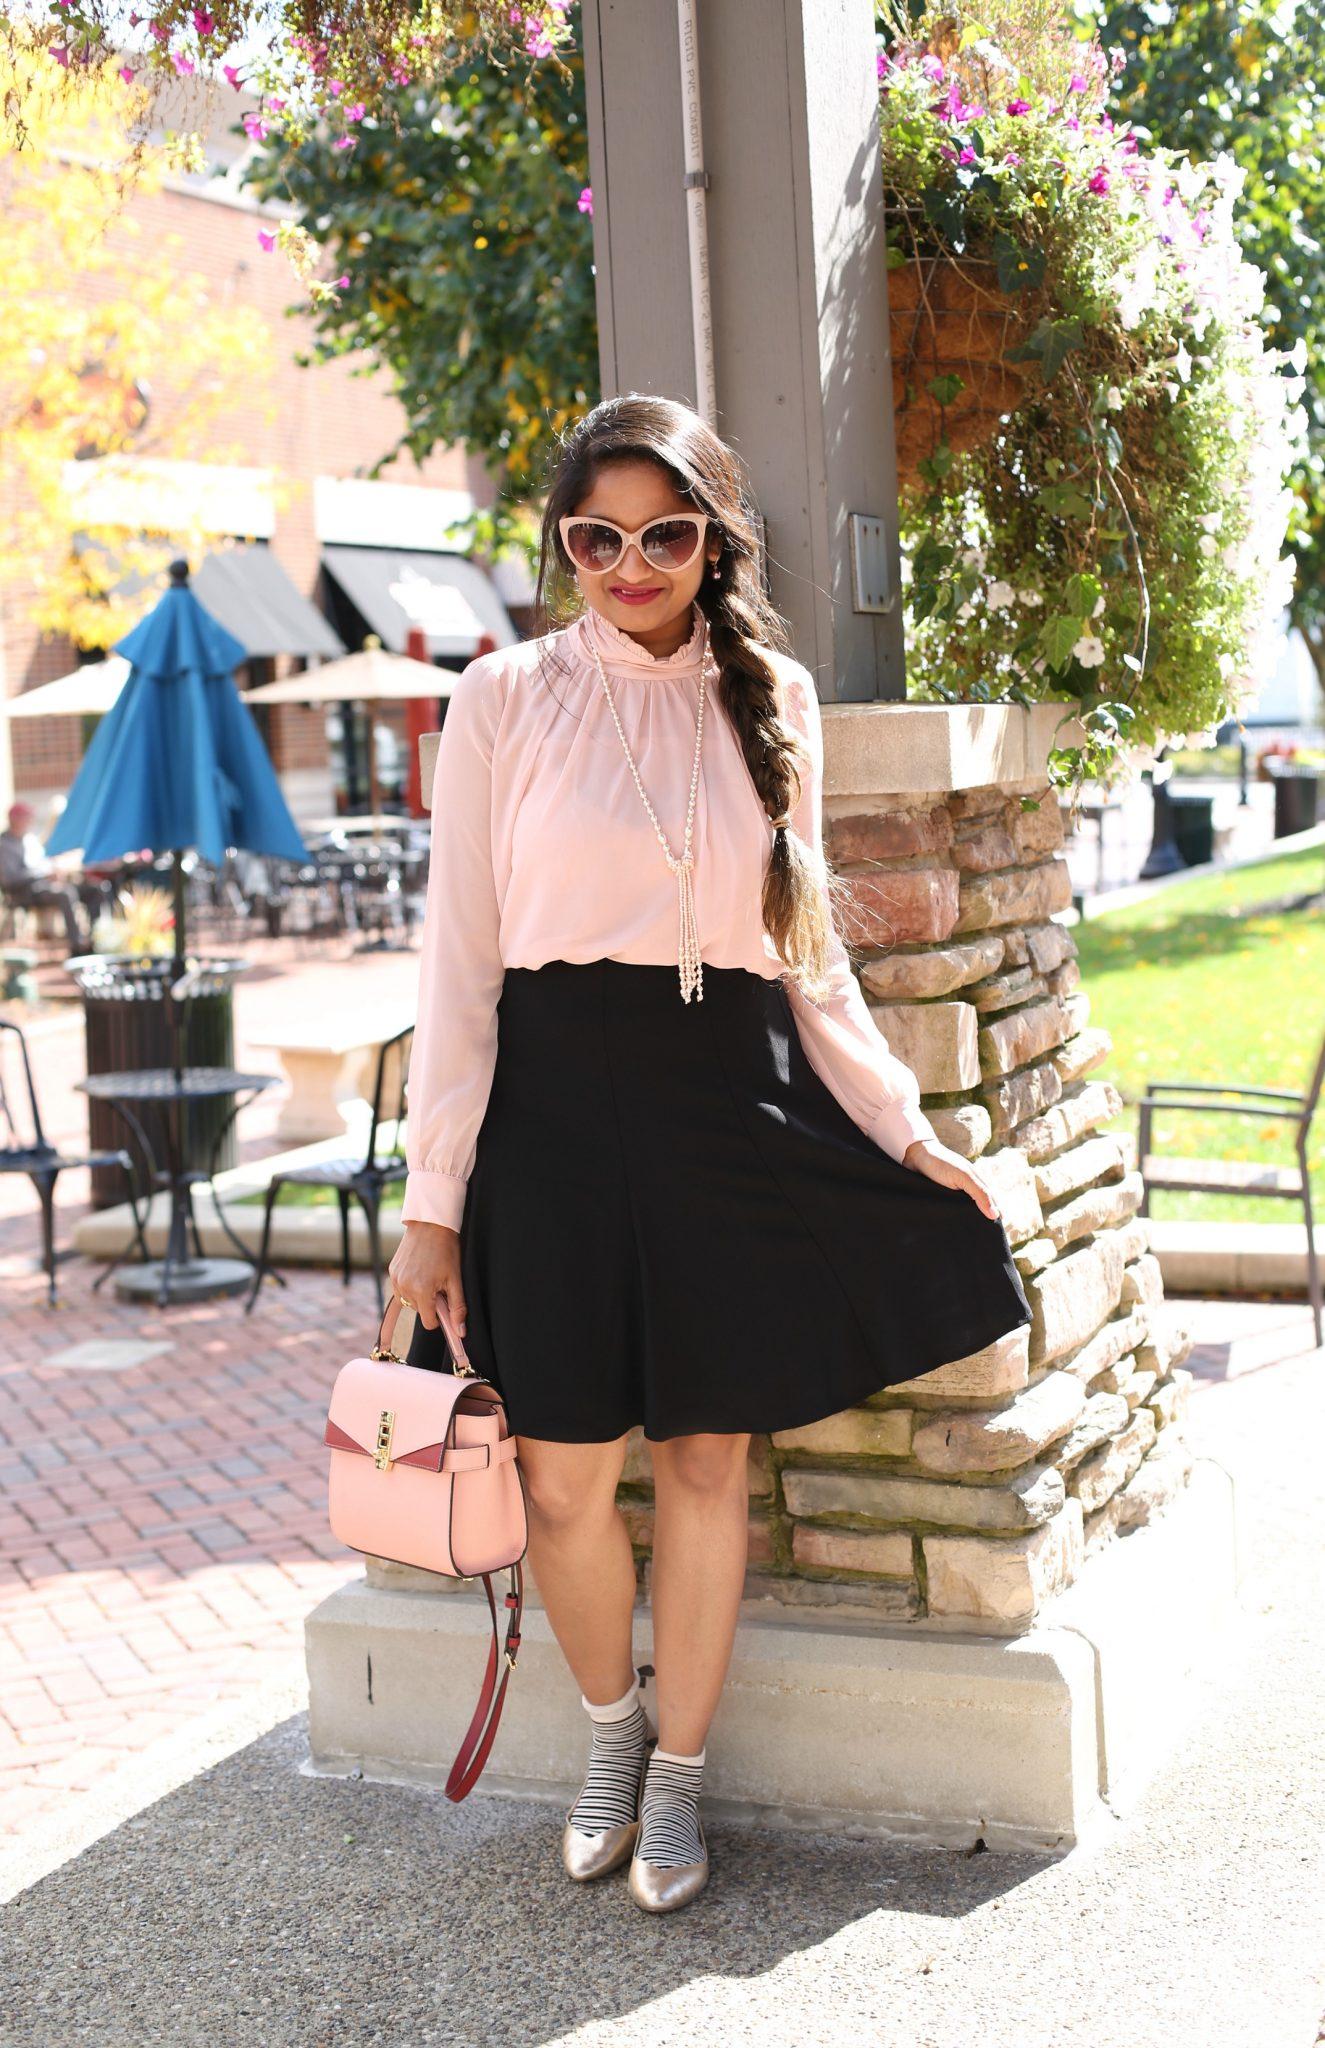 henri-bendel-uptown-mini-blocked-satchel-pink